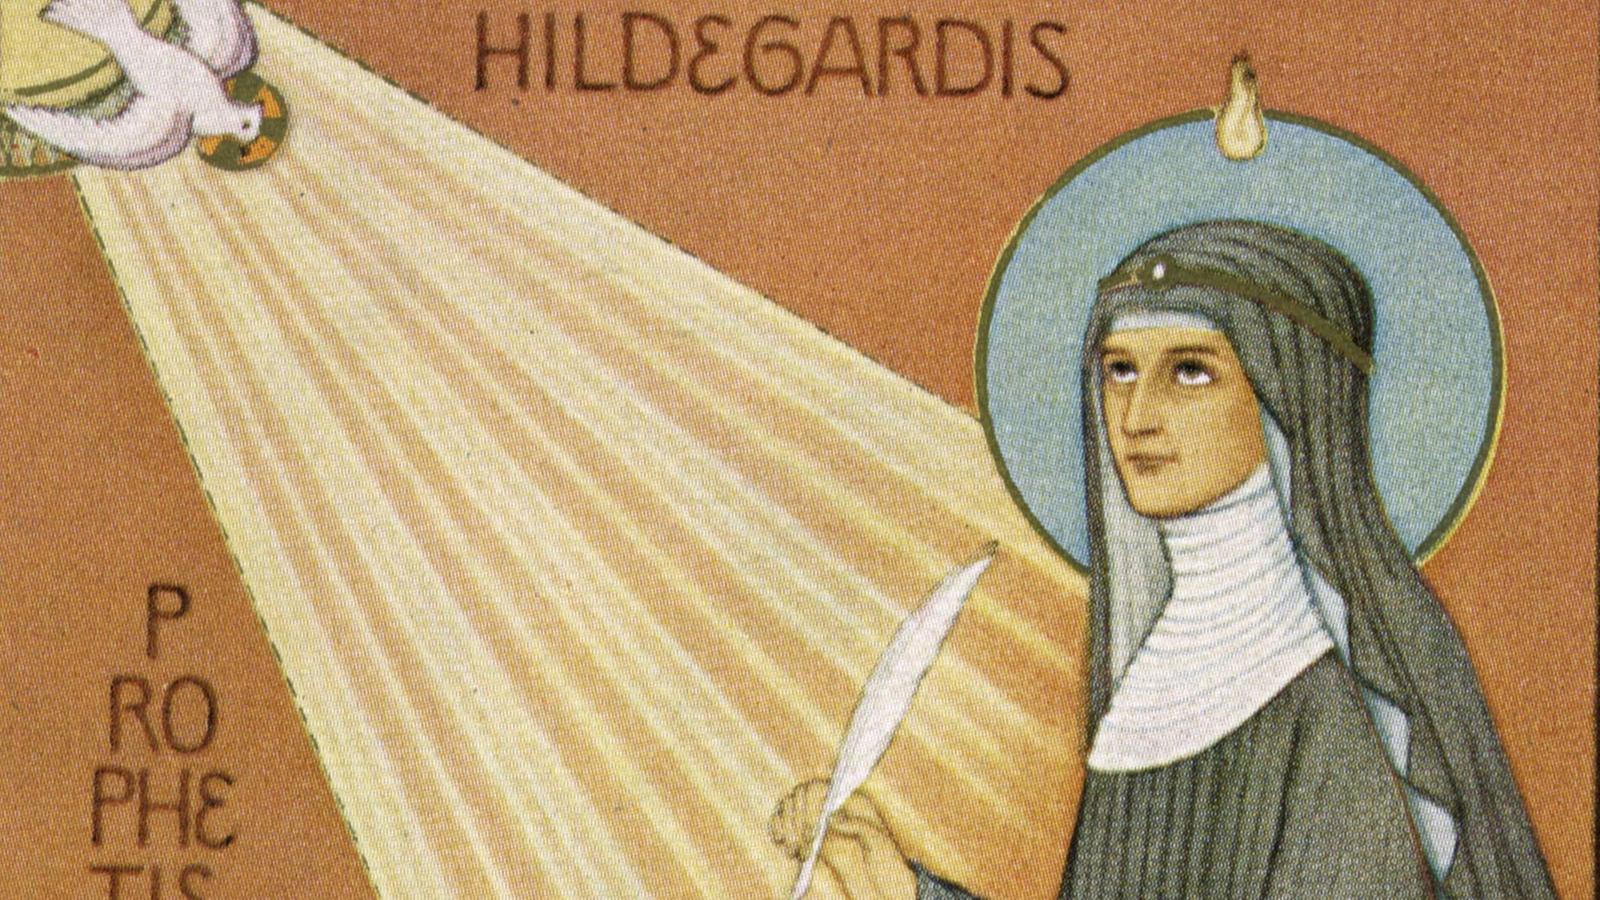 Klostermedizin: Hildegard von Bingen Medizin